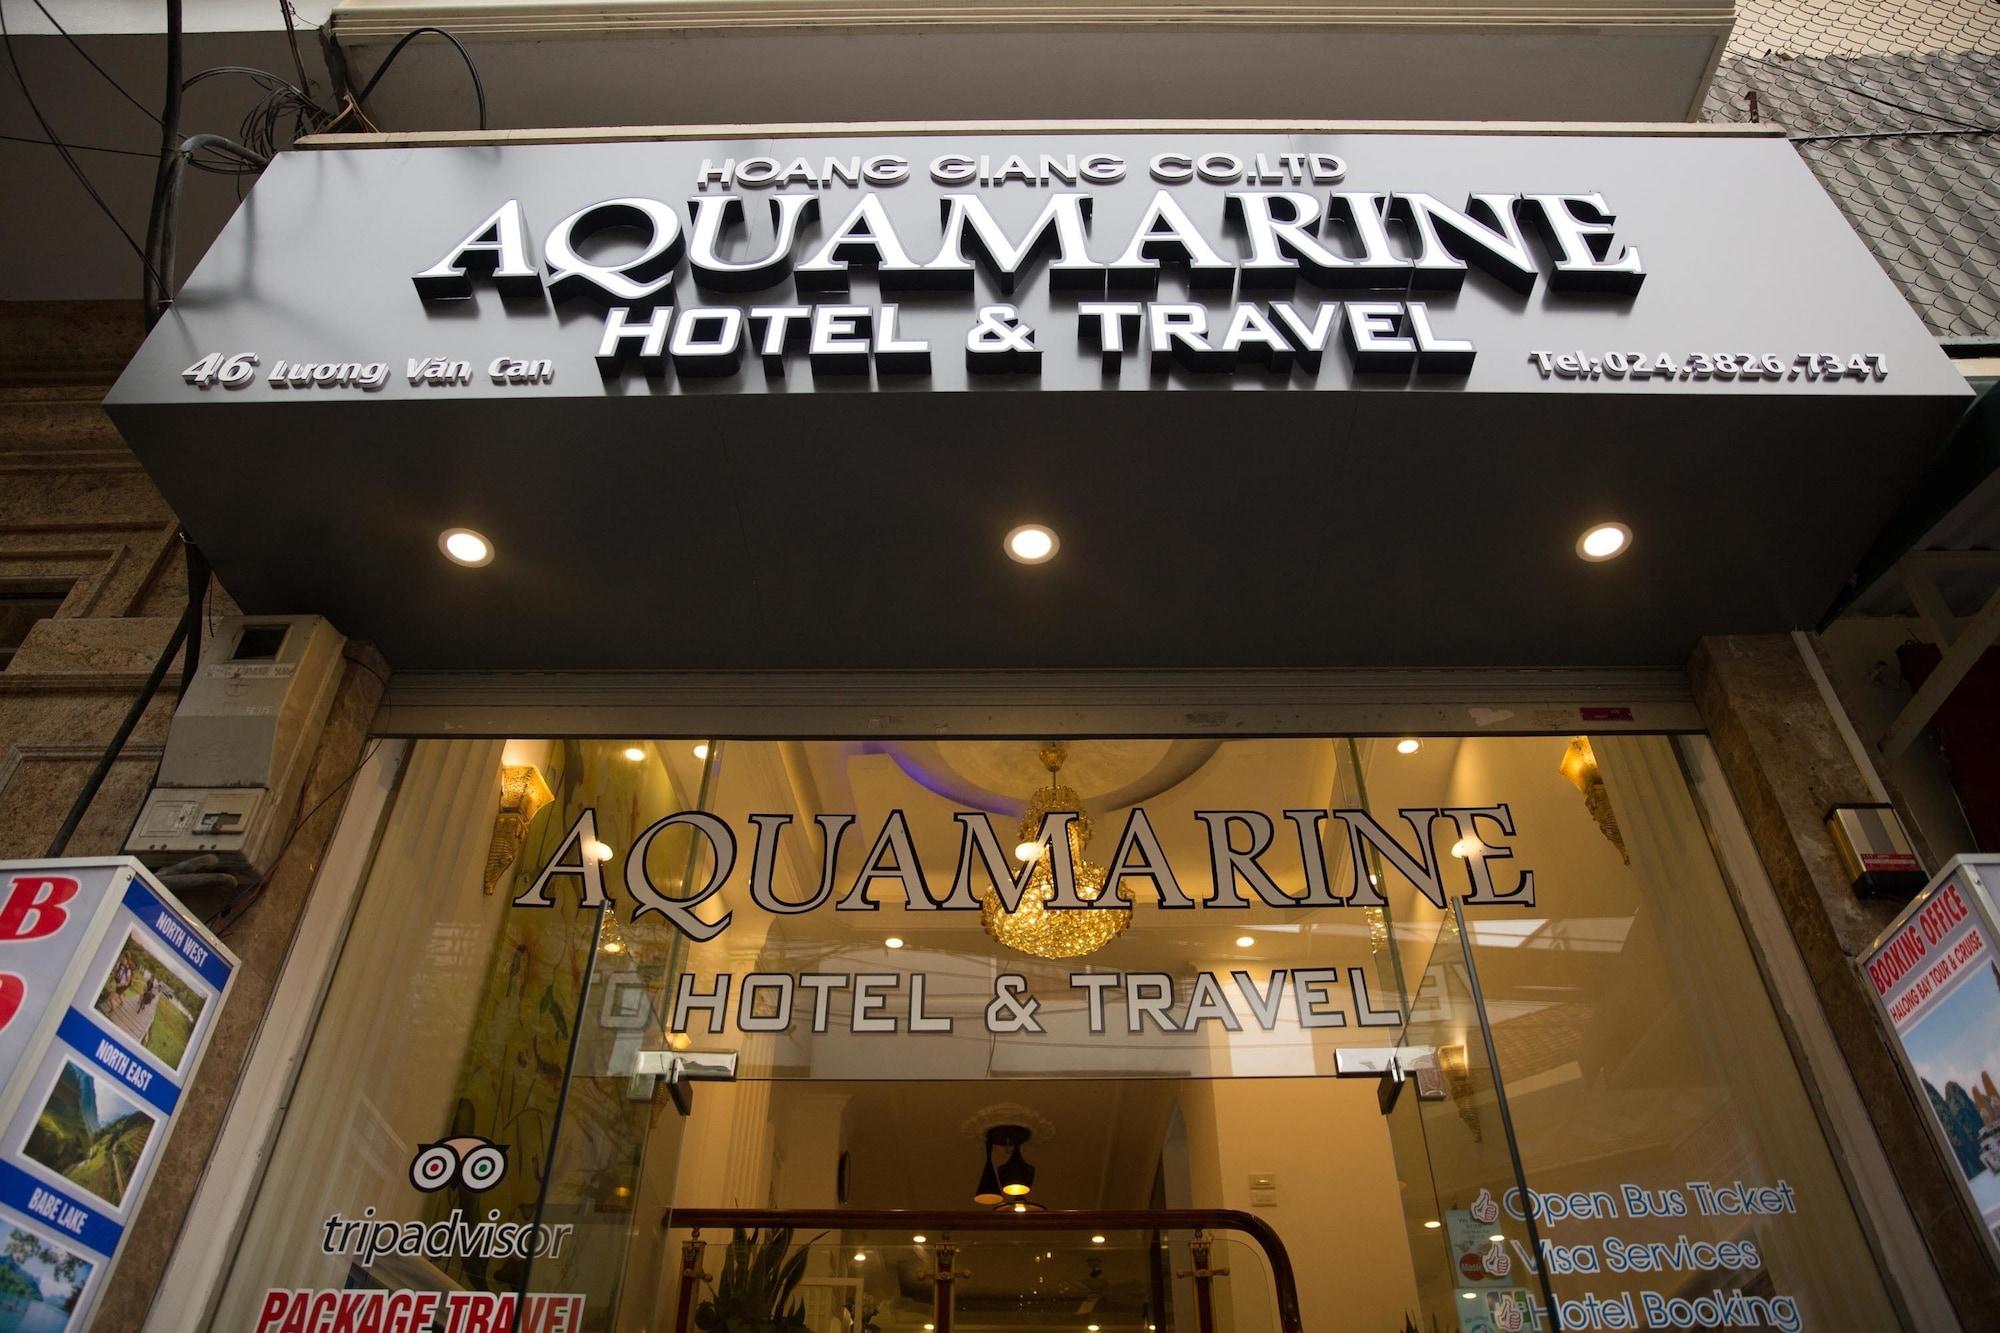 Aquamarine Hotel & Travel, Hoàn Kiếm